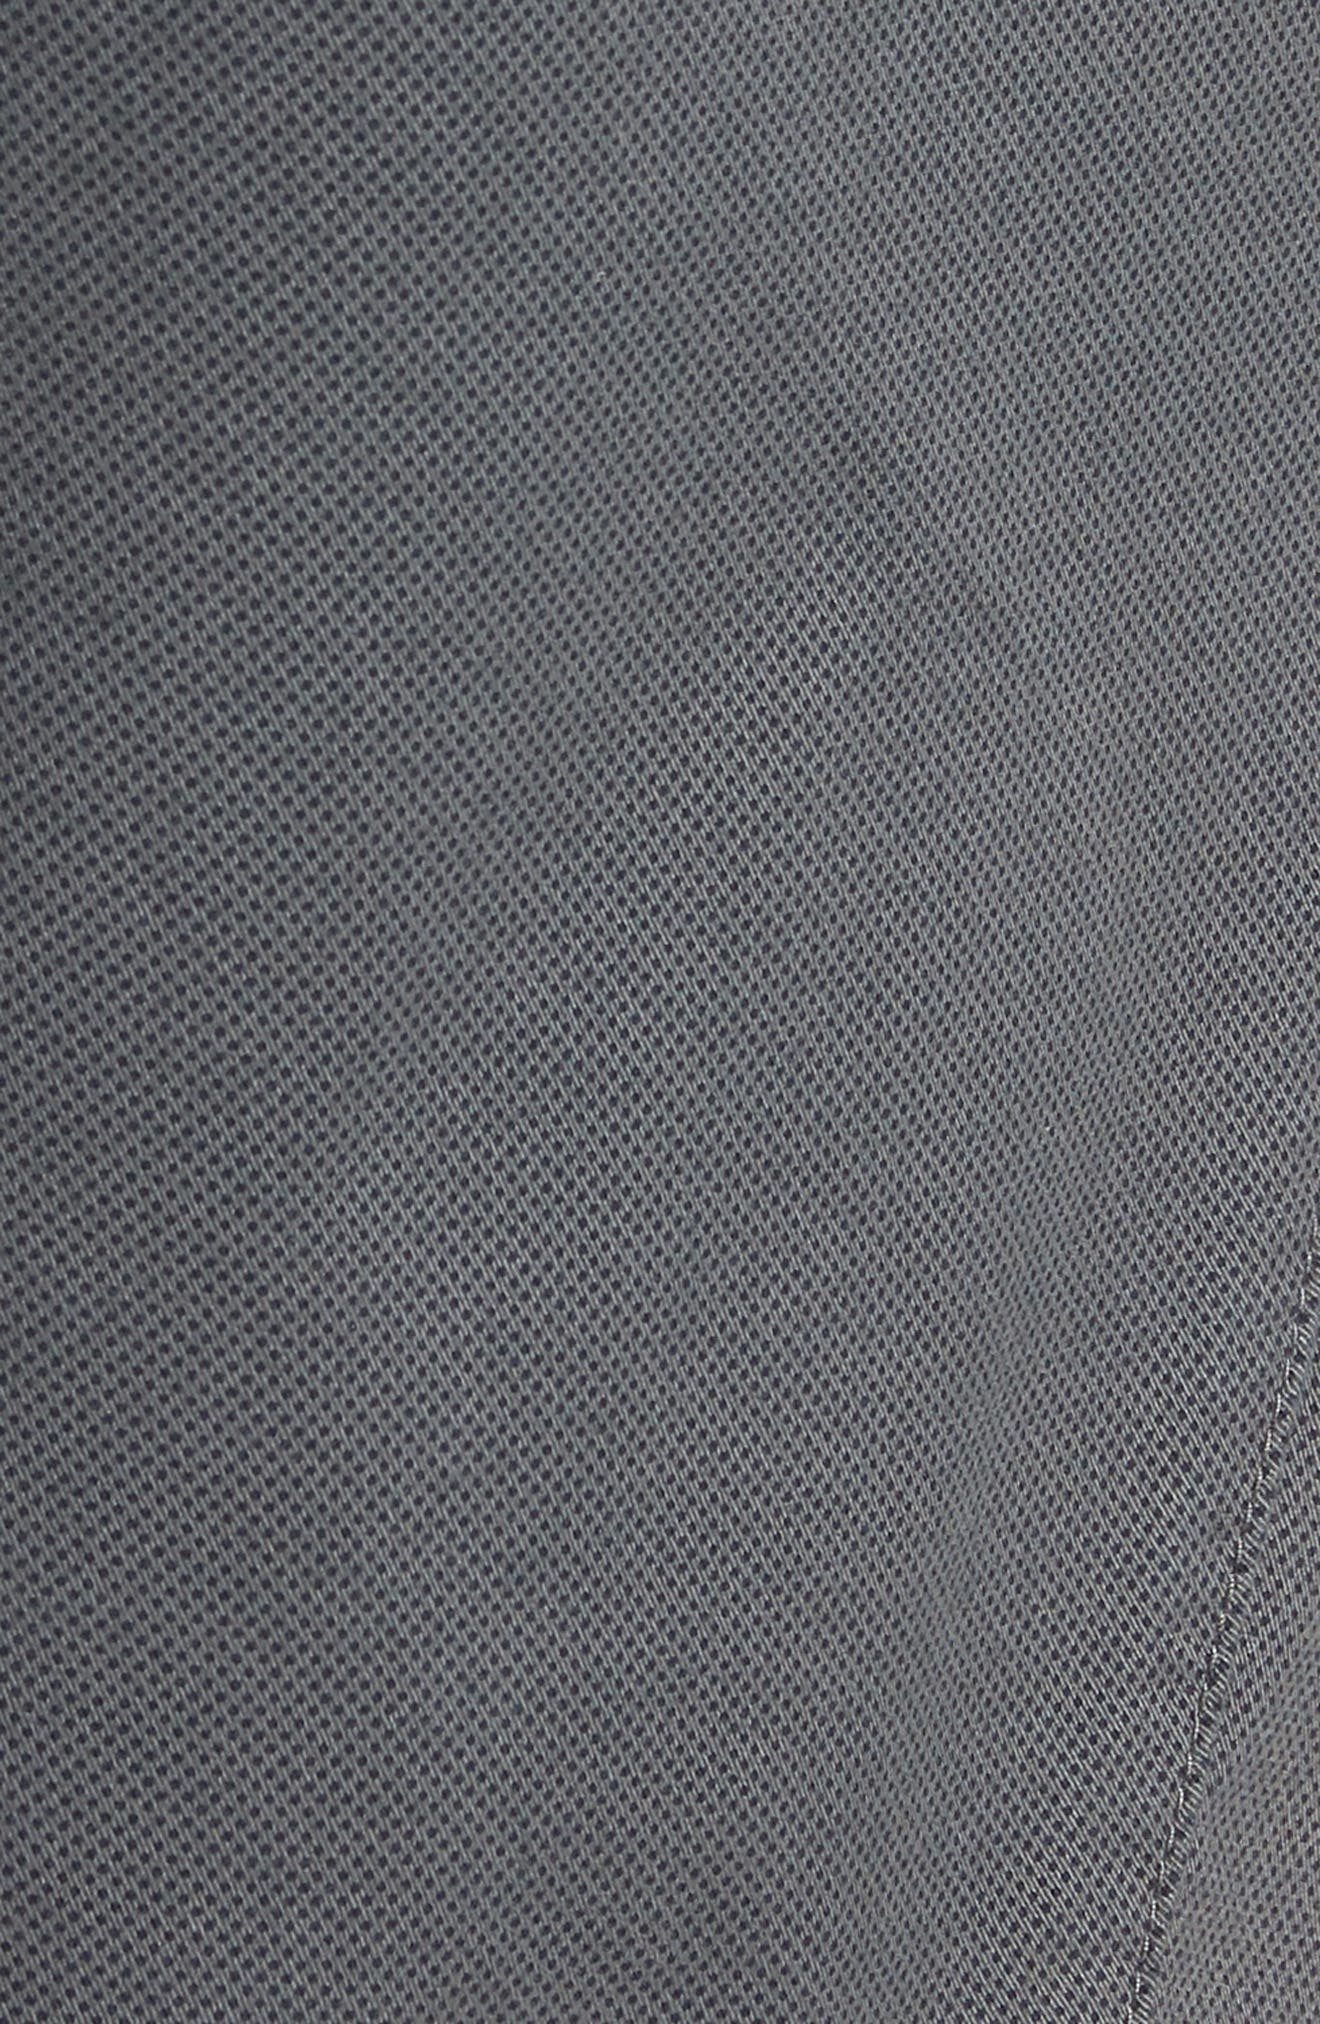 Wrap Microdot Stretch Chino Shorts,                             Alternate thumbnail 5, color,                             051